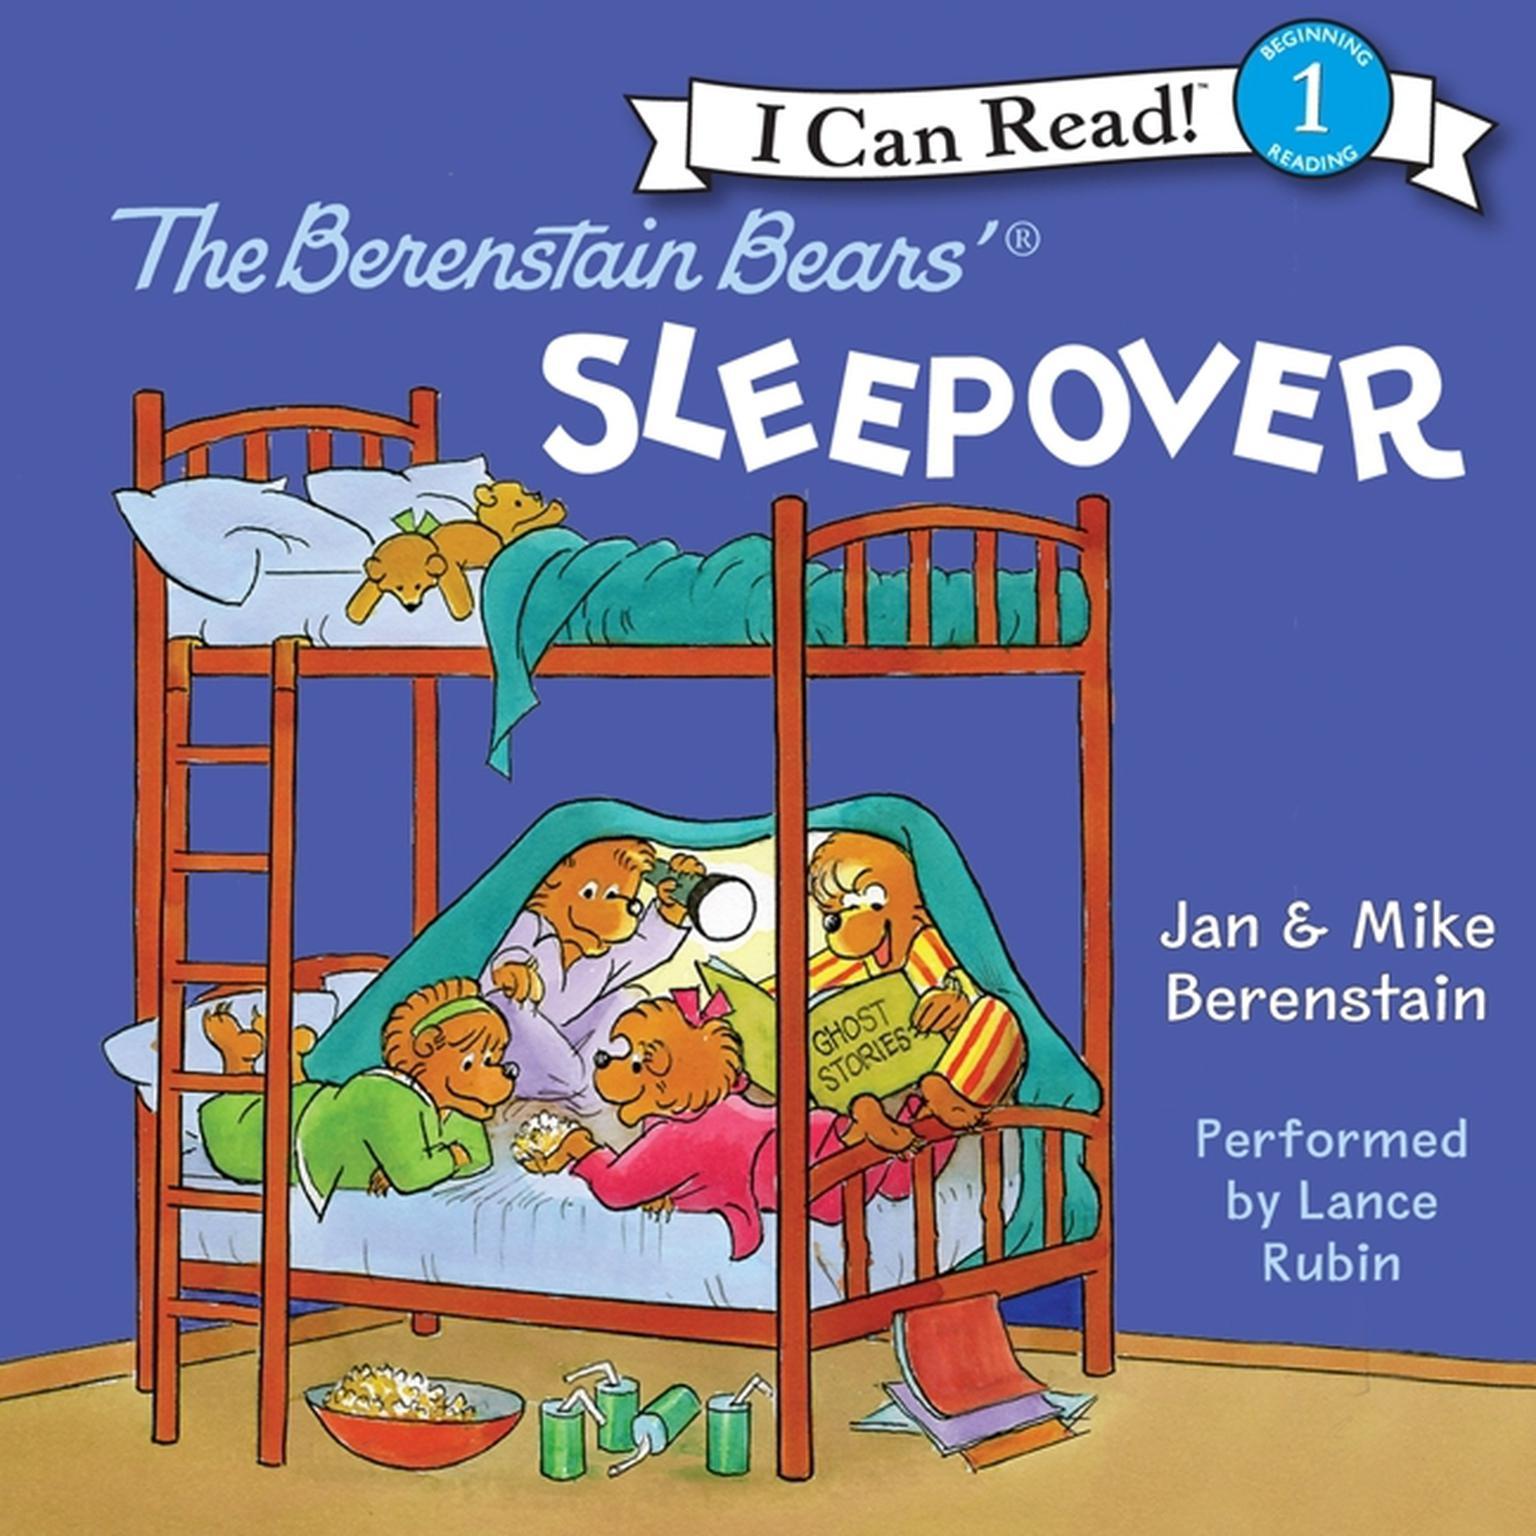 The Berenstain Bears Sleepover